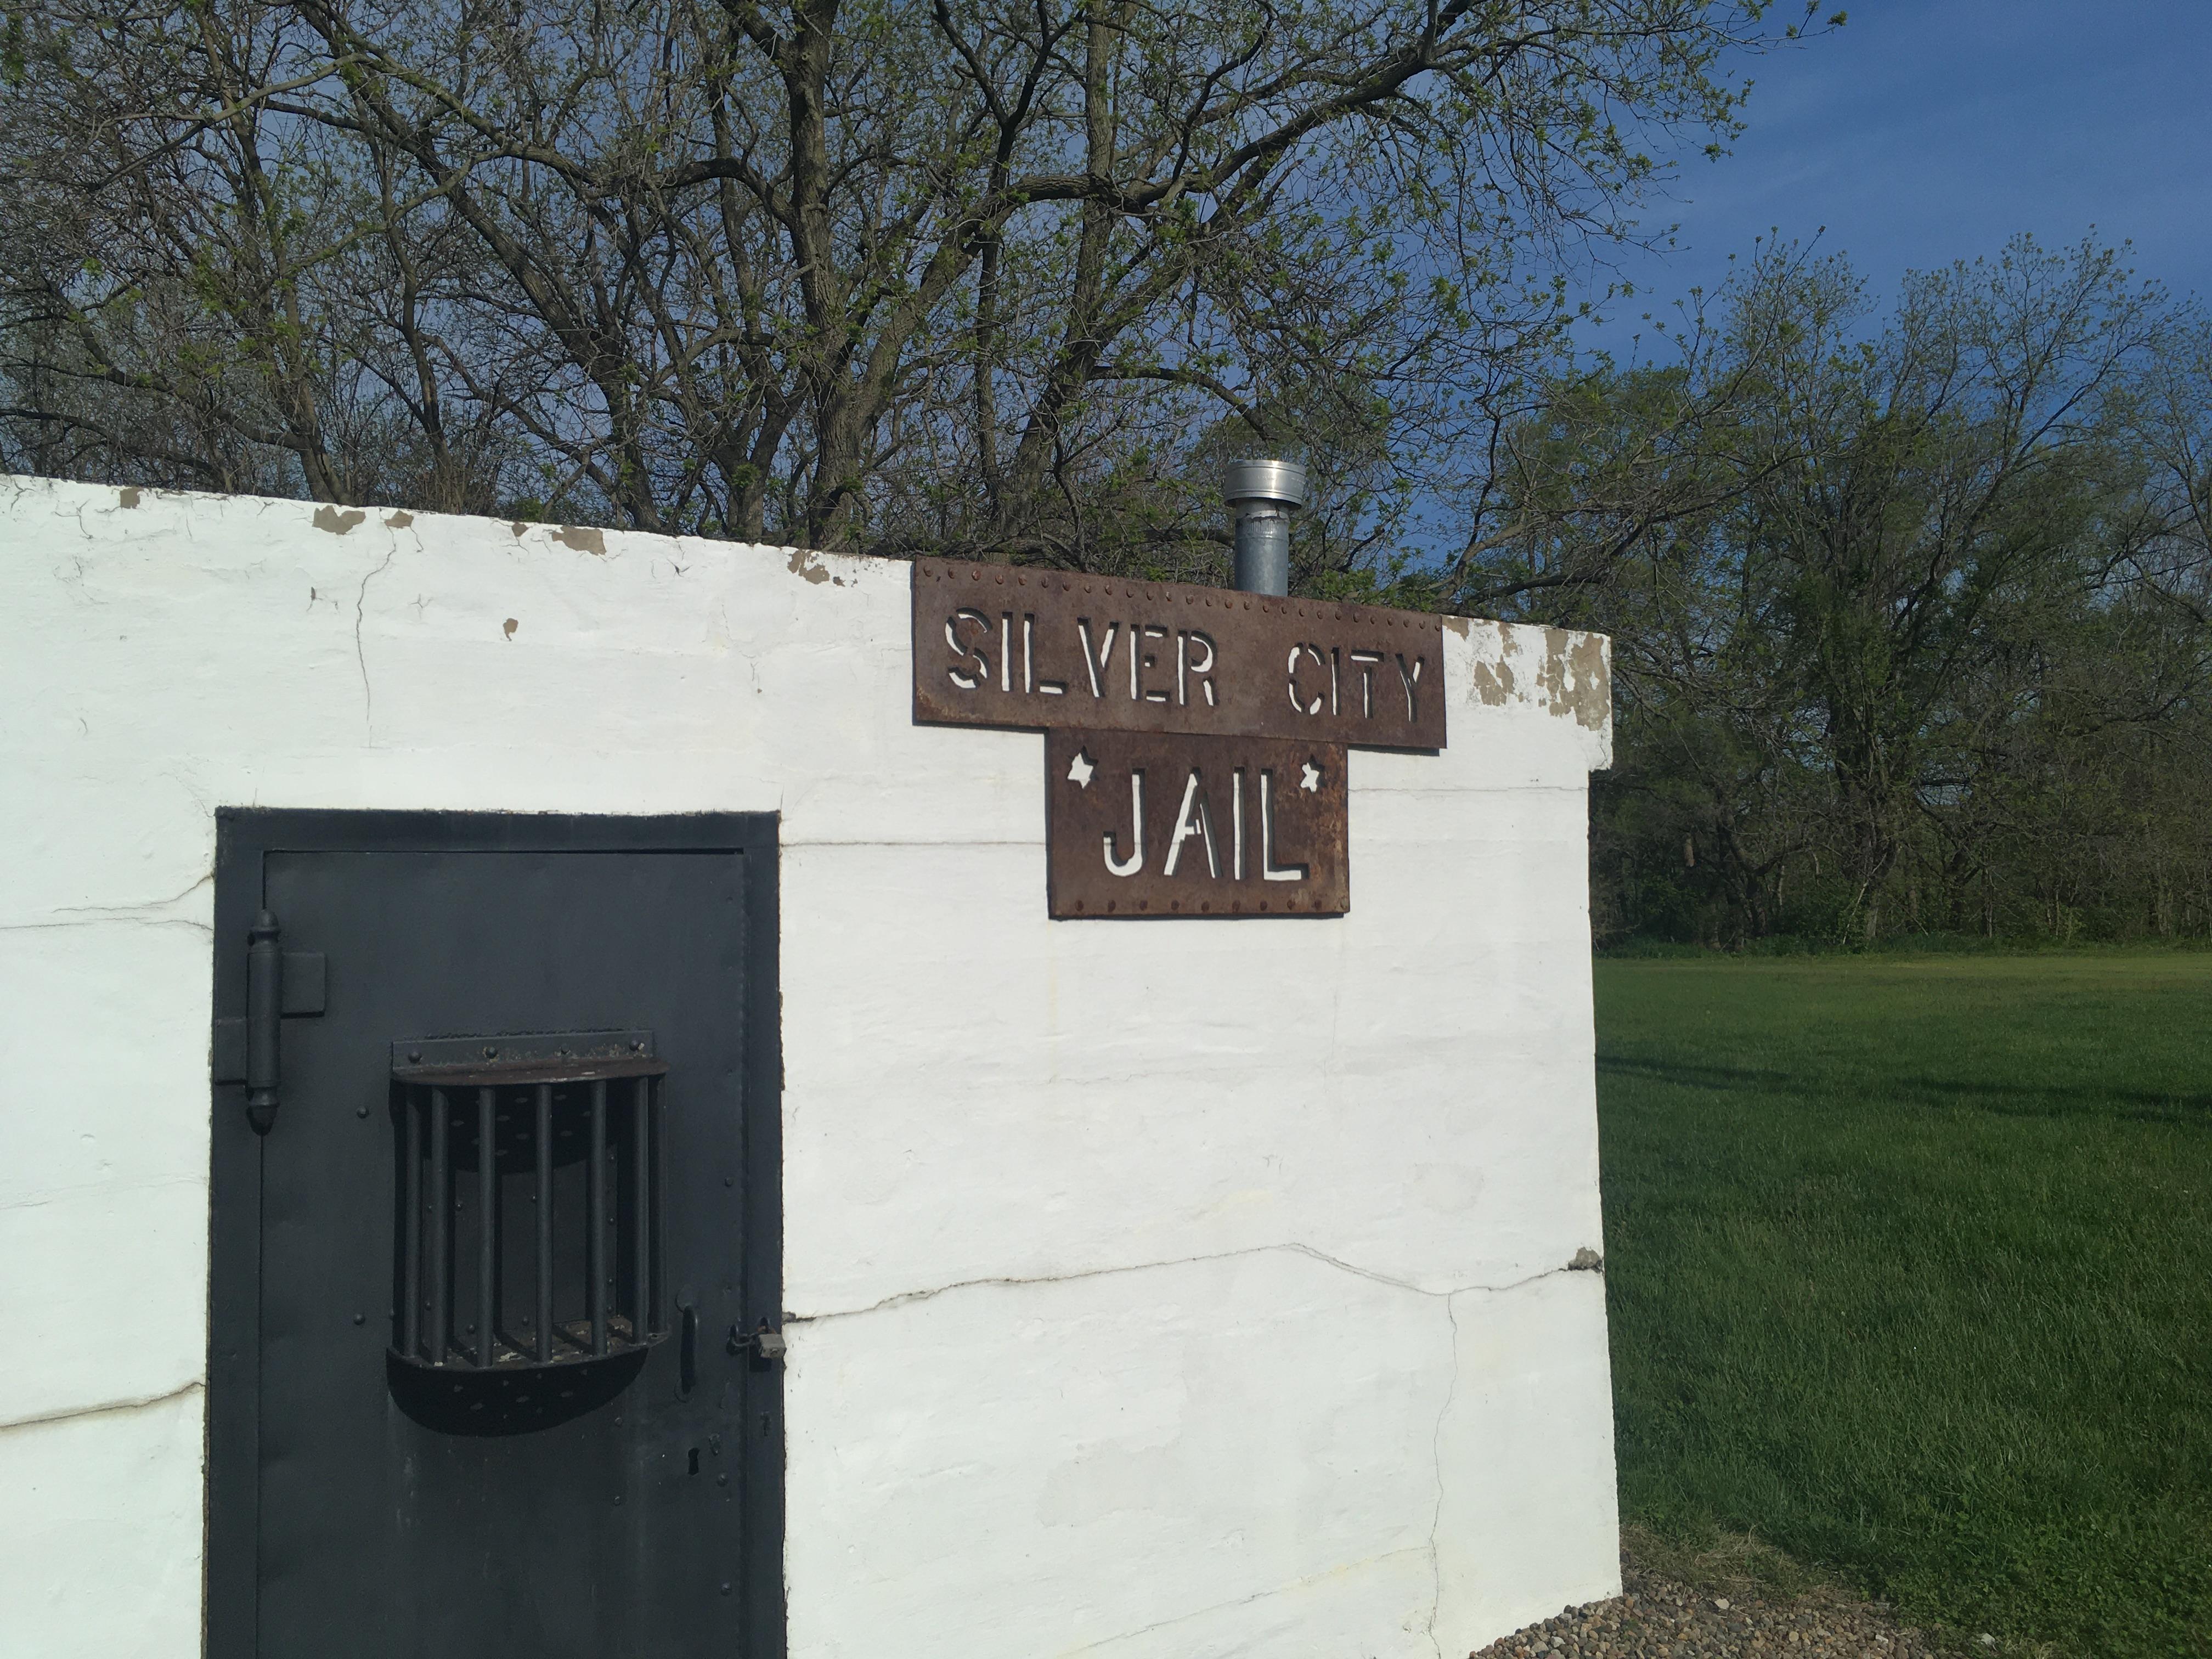 Silver City Jail